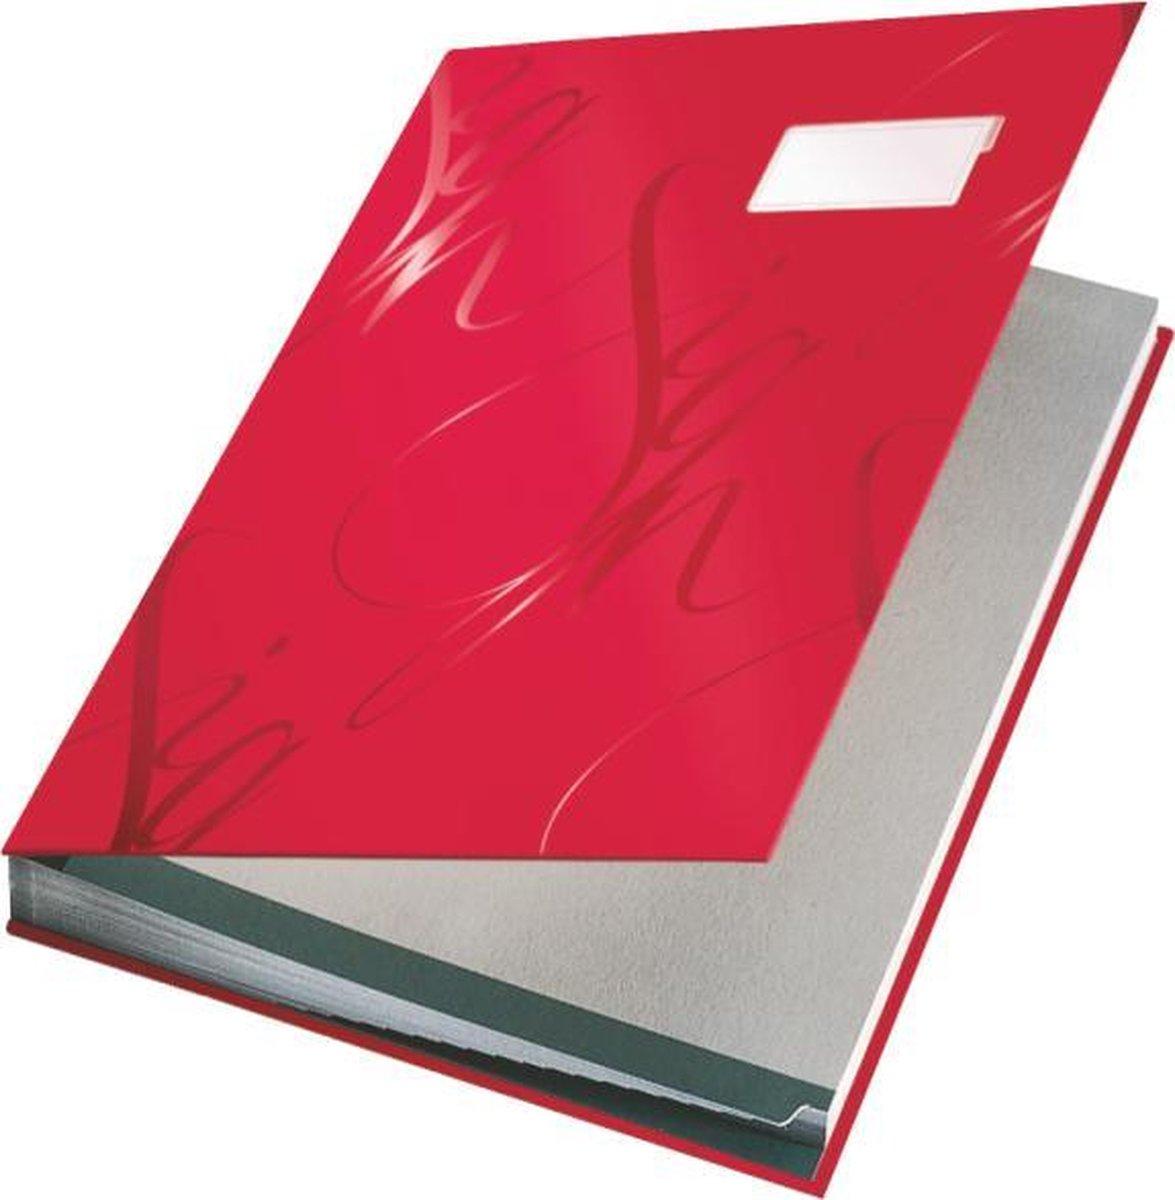 Leitz - Design Vloeiboek - Karton - 18 scheidingsbladen - Rood